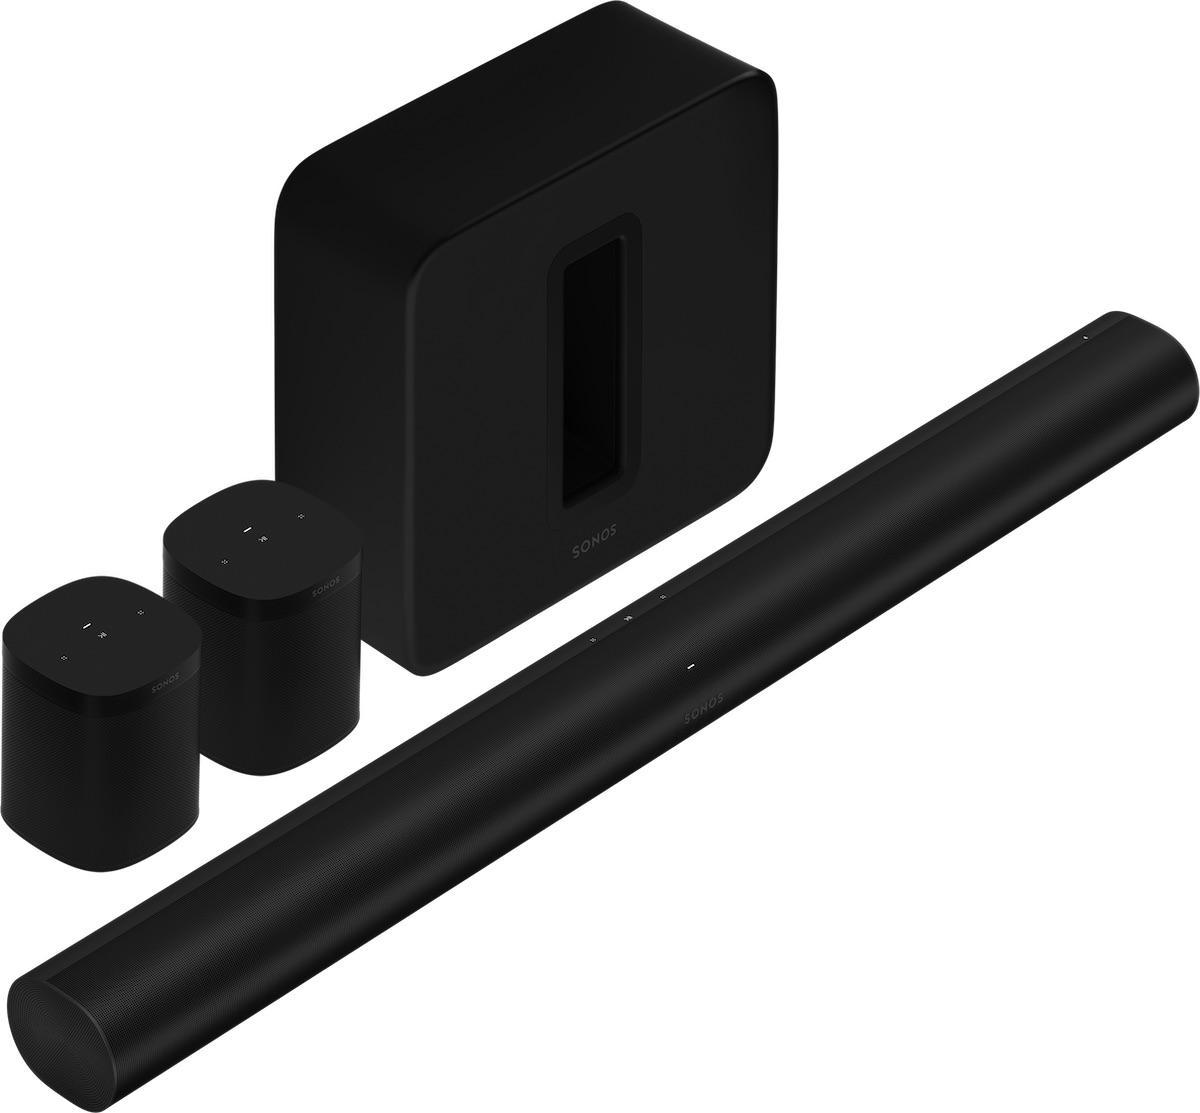 Sonos Arc Soundbar with Sub and One SL Speakers